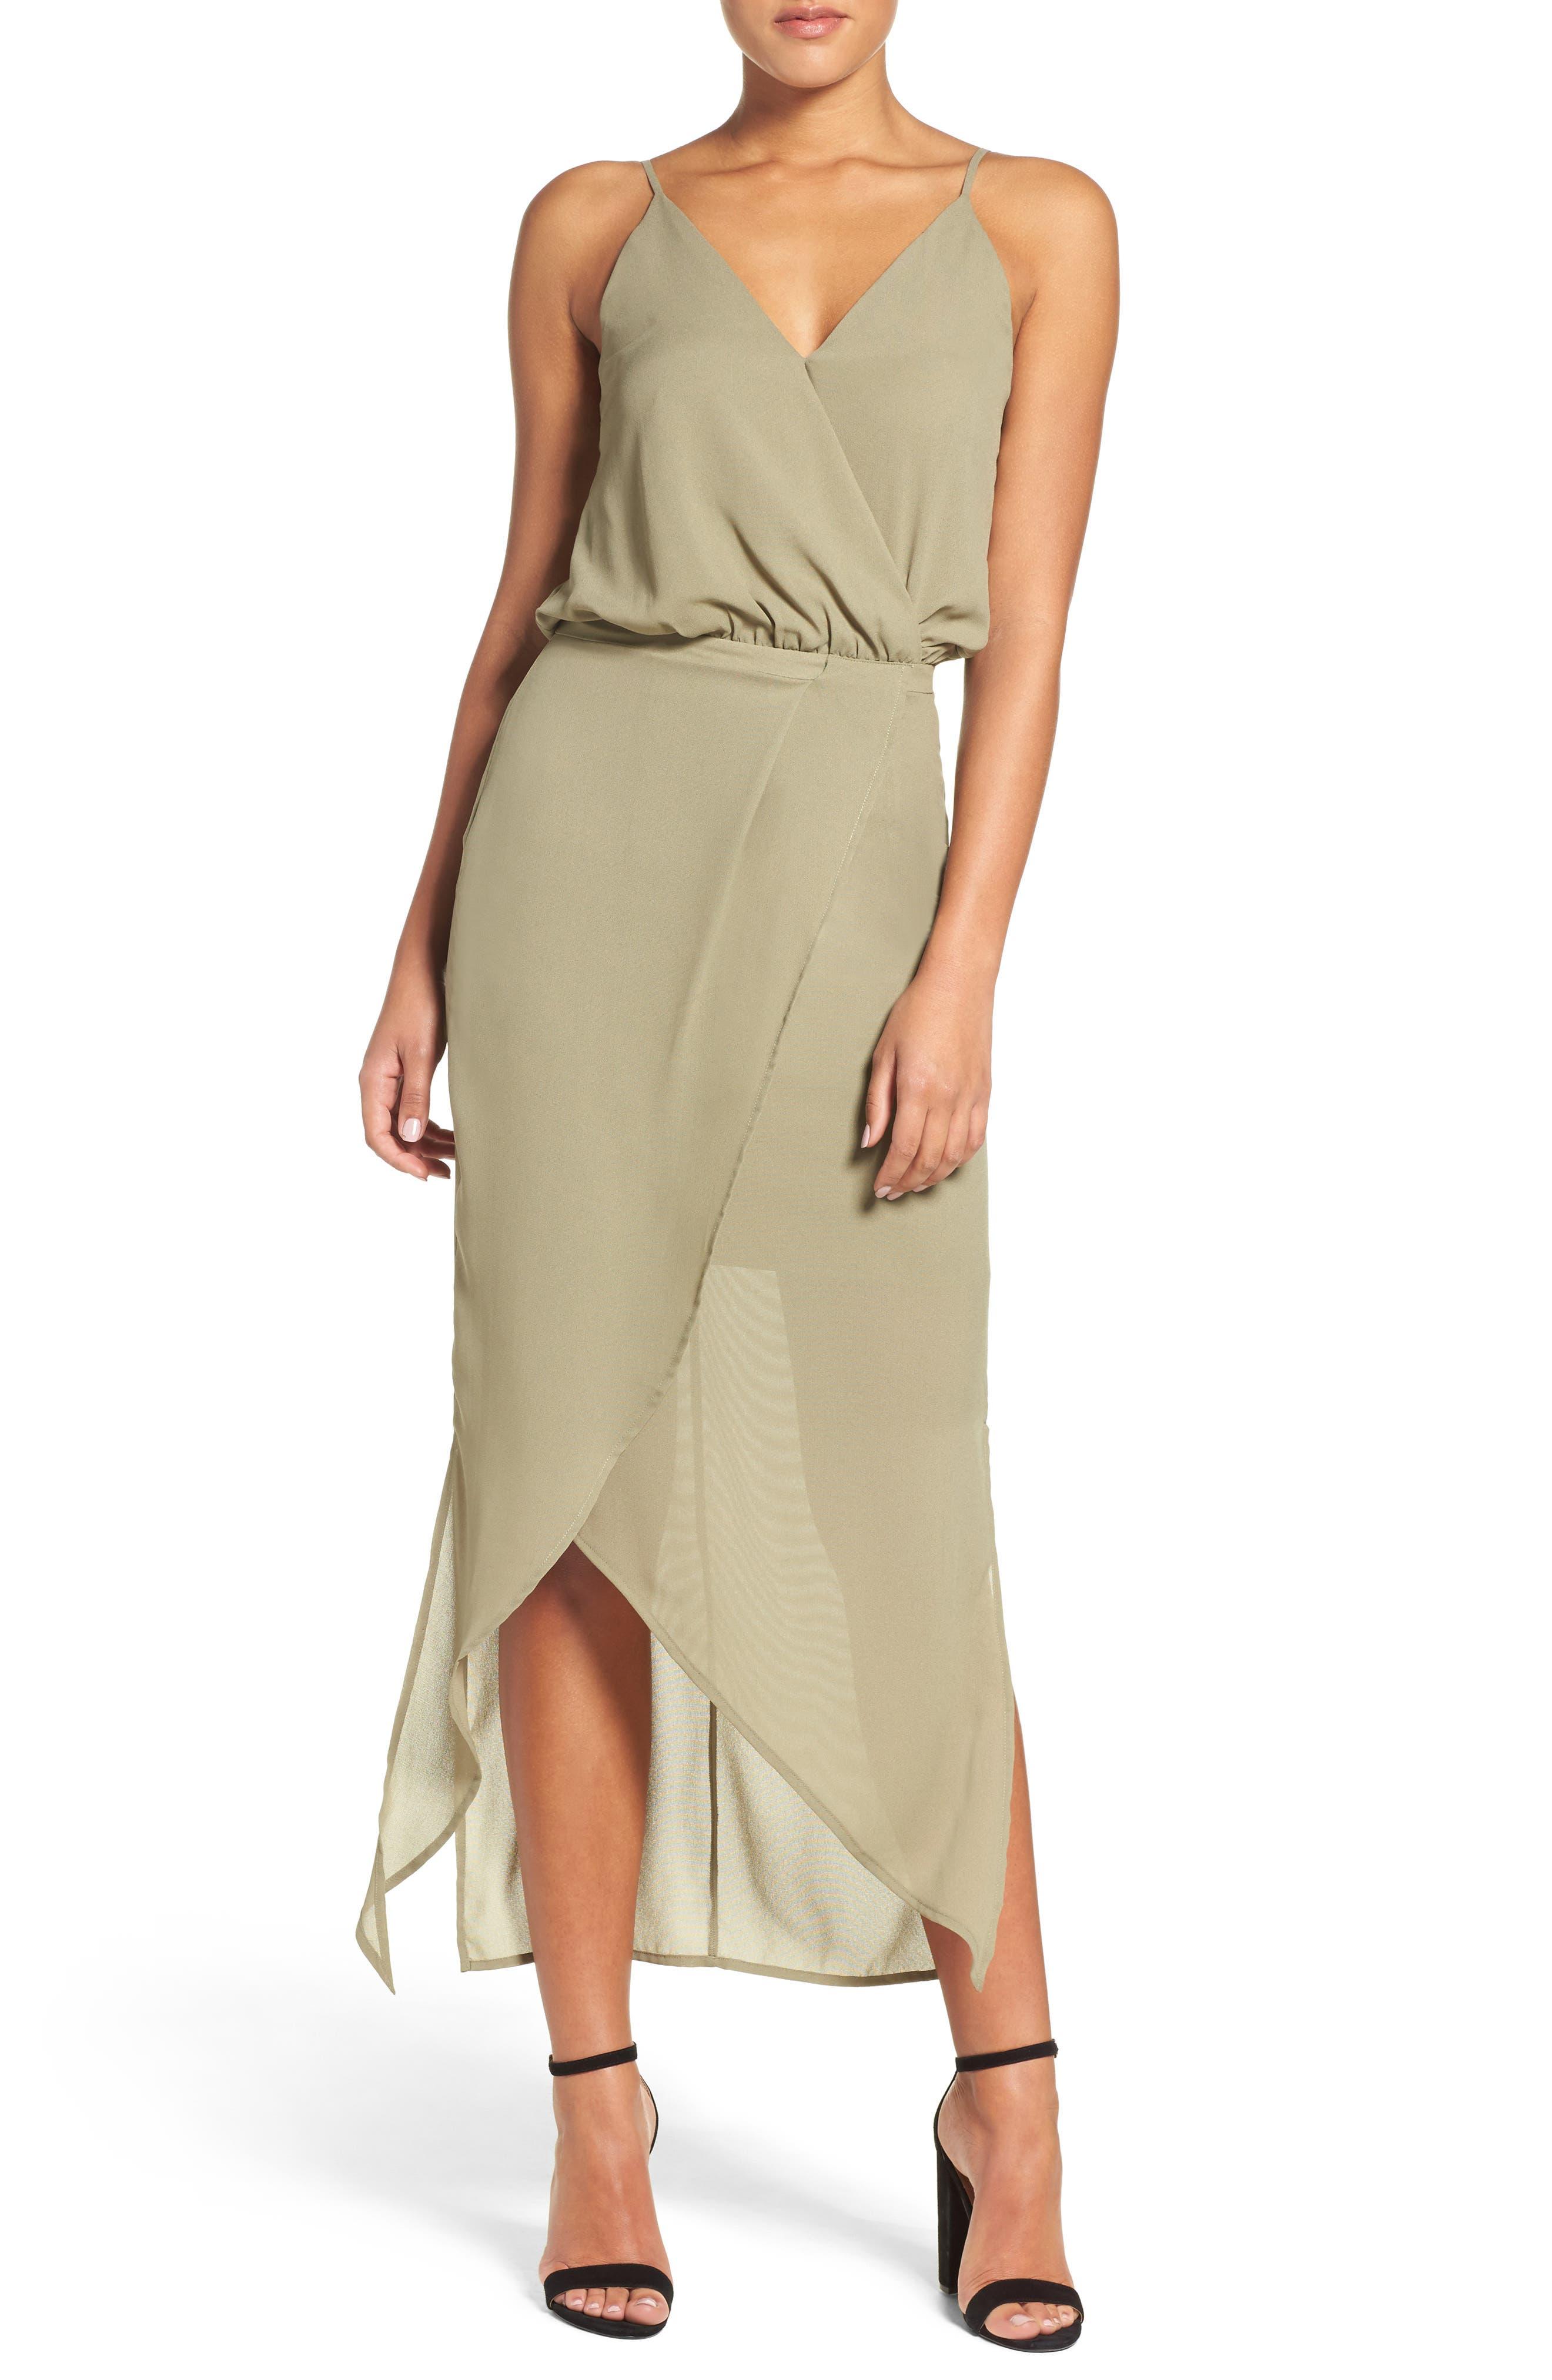 Alternate Image 1 Selected - Cooper St Illustrious Maxi Dress